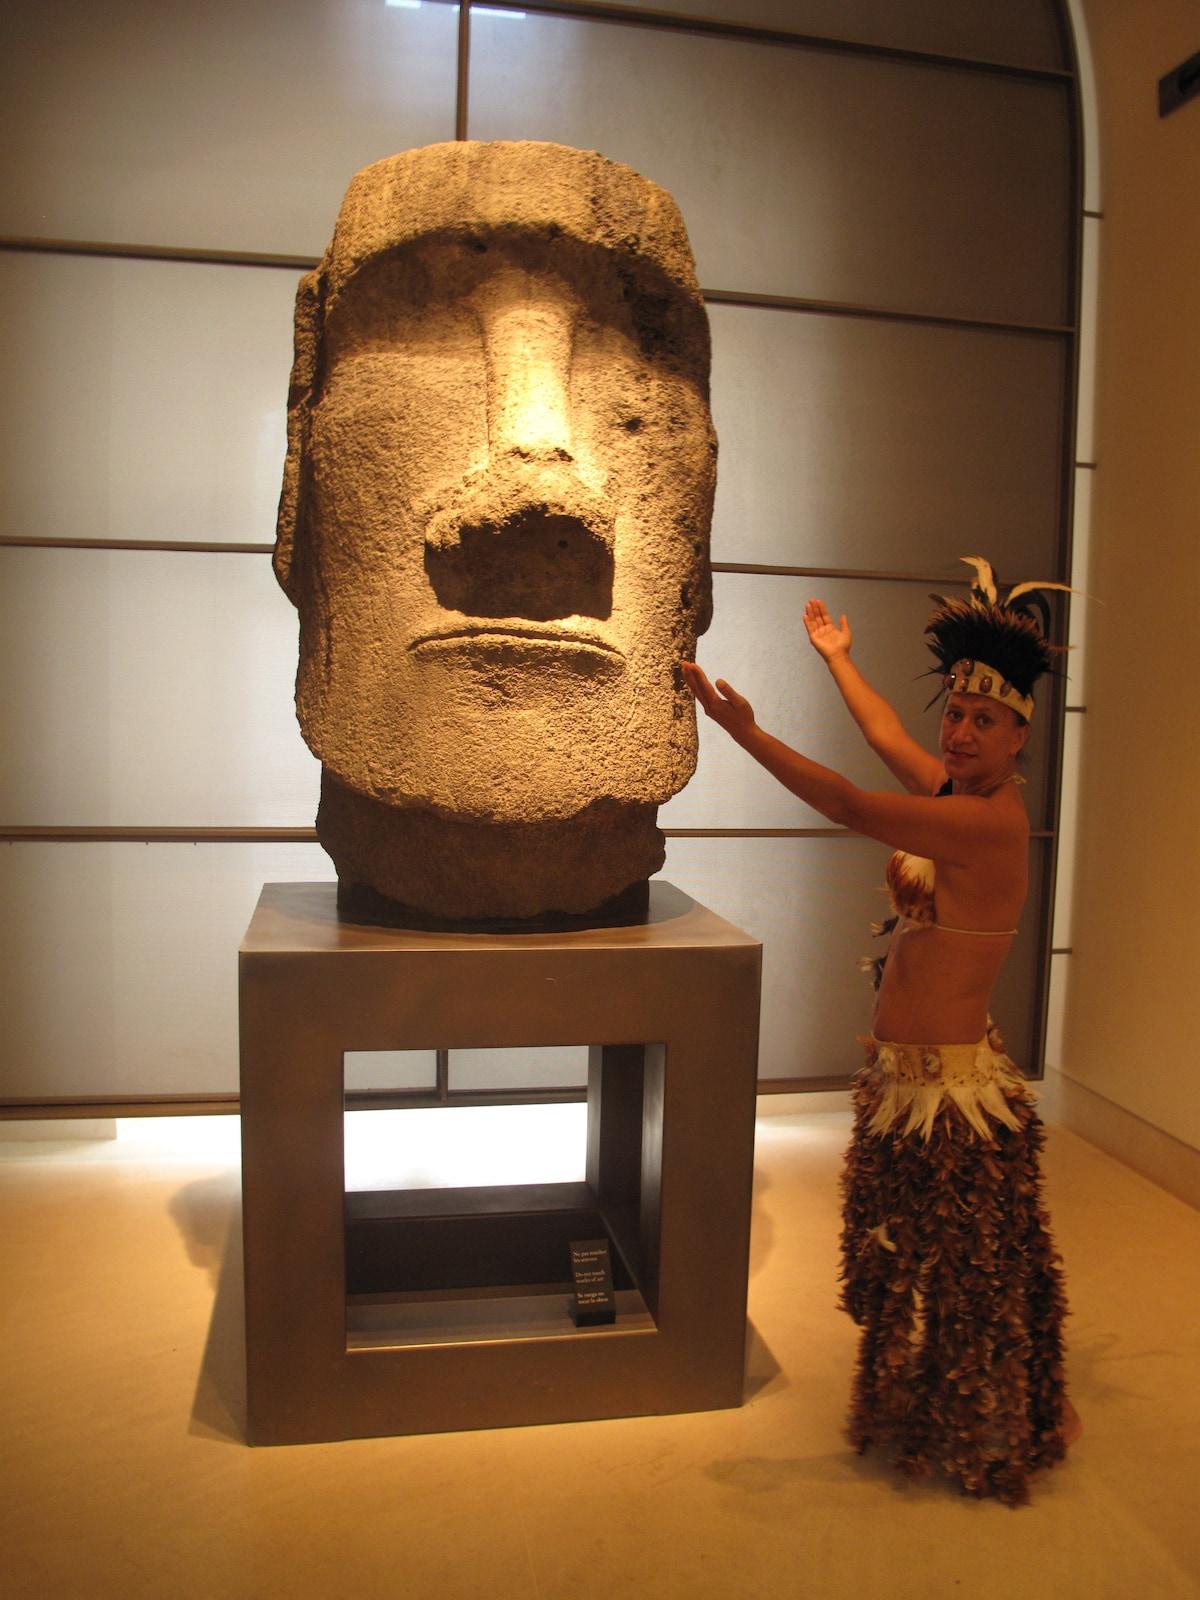 Maria Rapa Nui from Easter Island